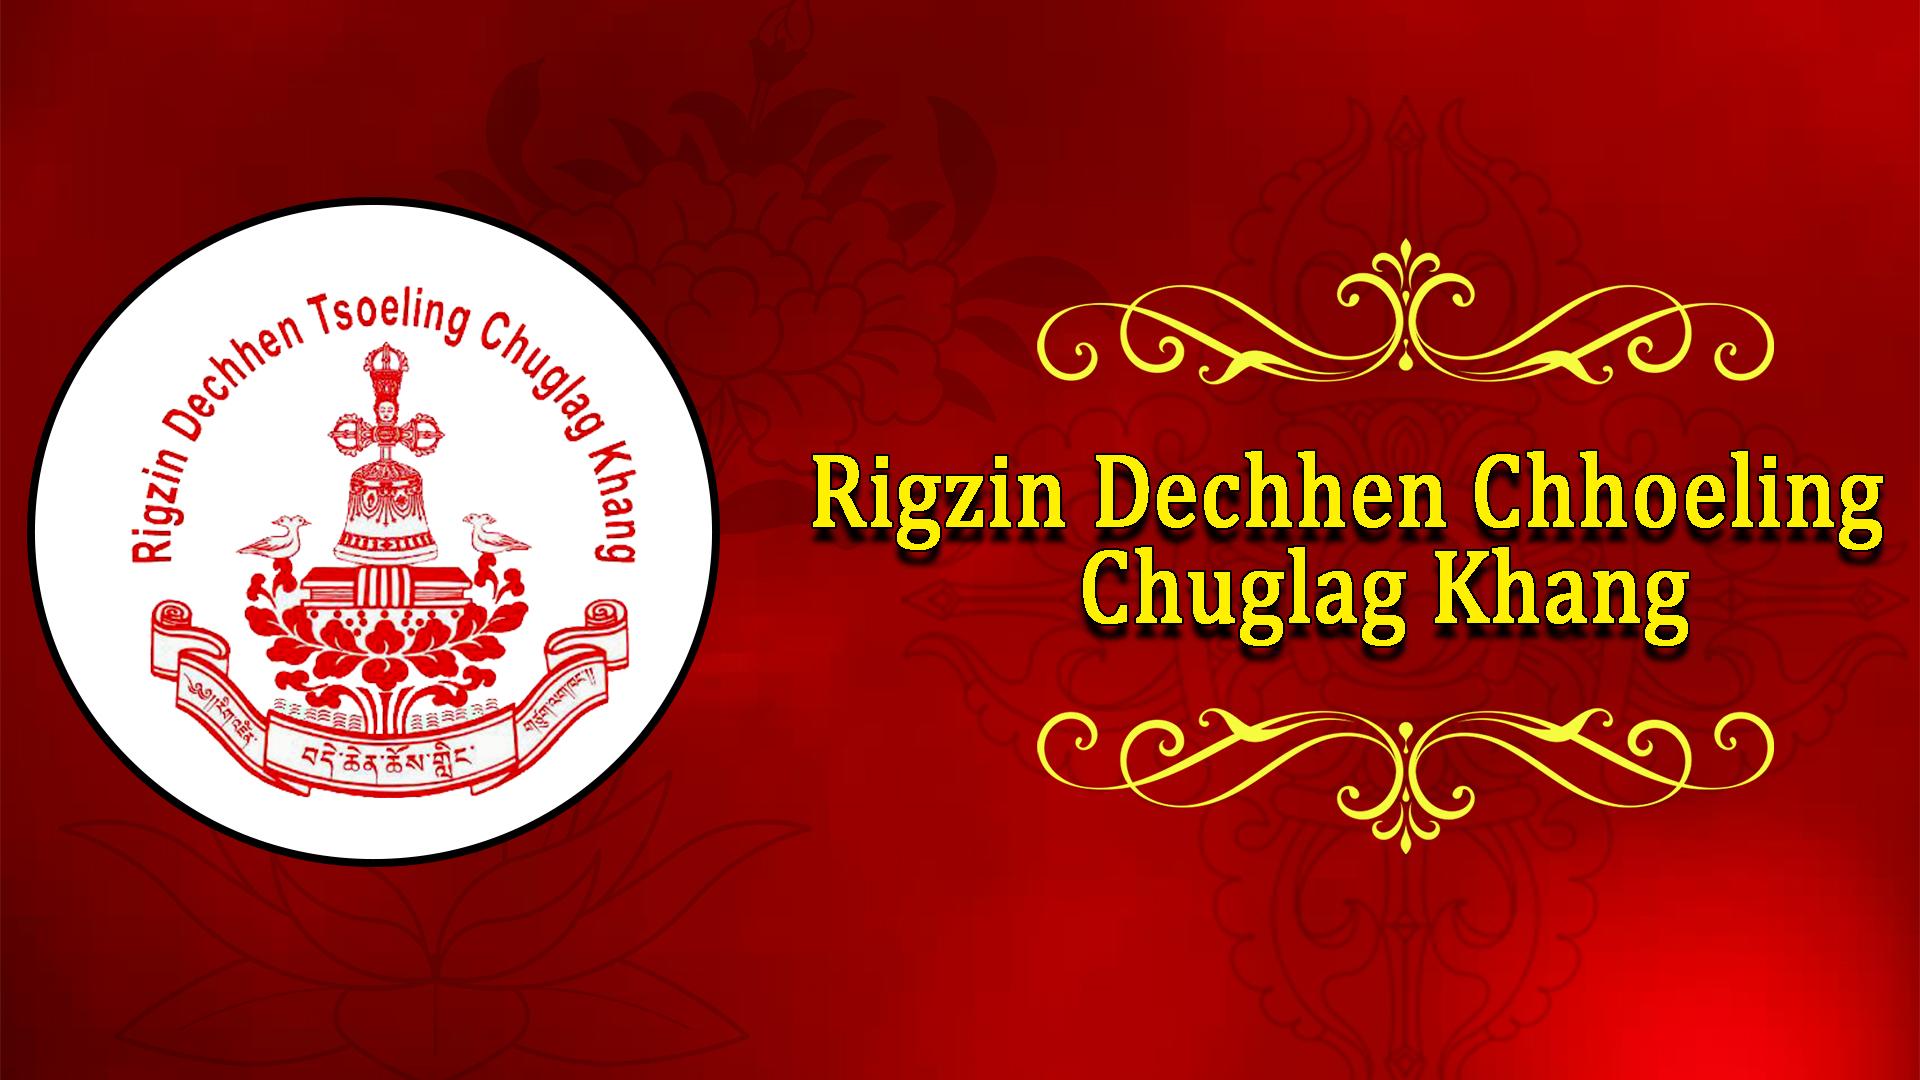 Rigzin Dechhen Chhoeling Chuglag Khang